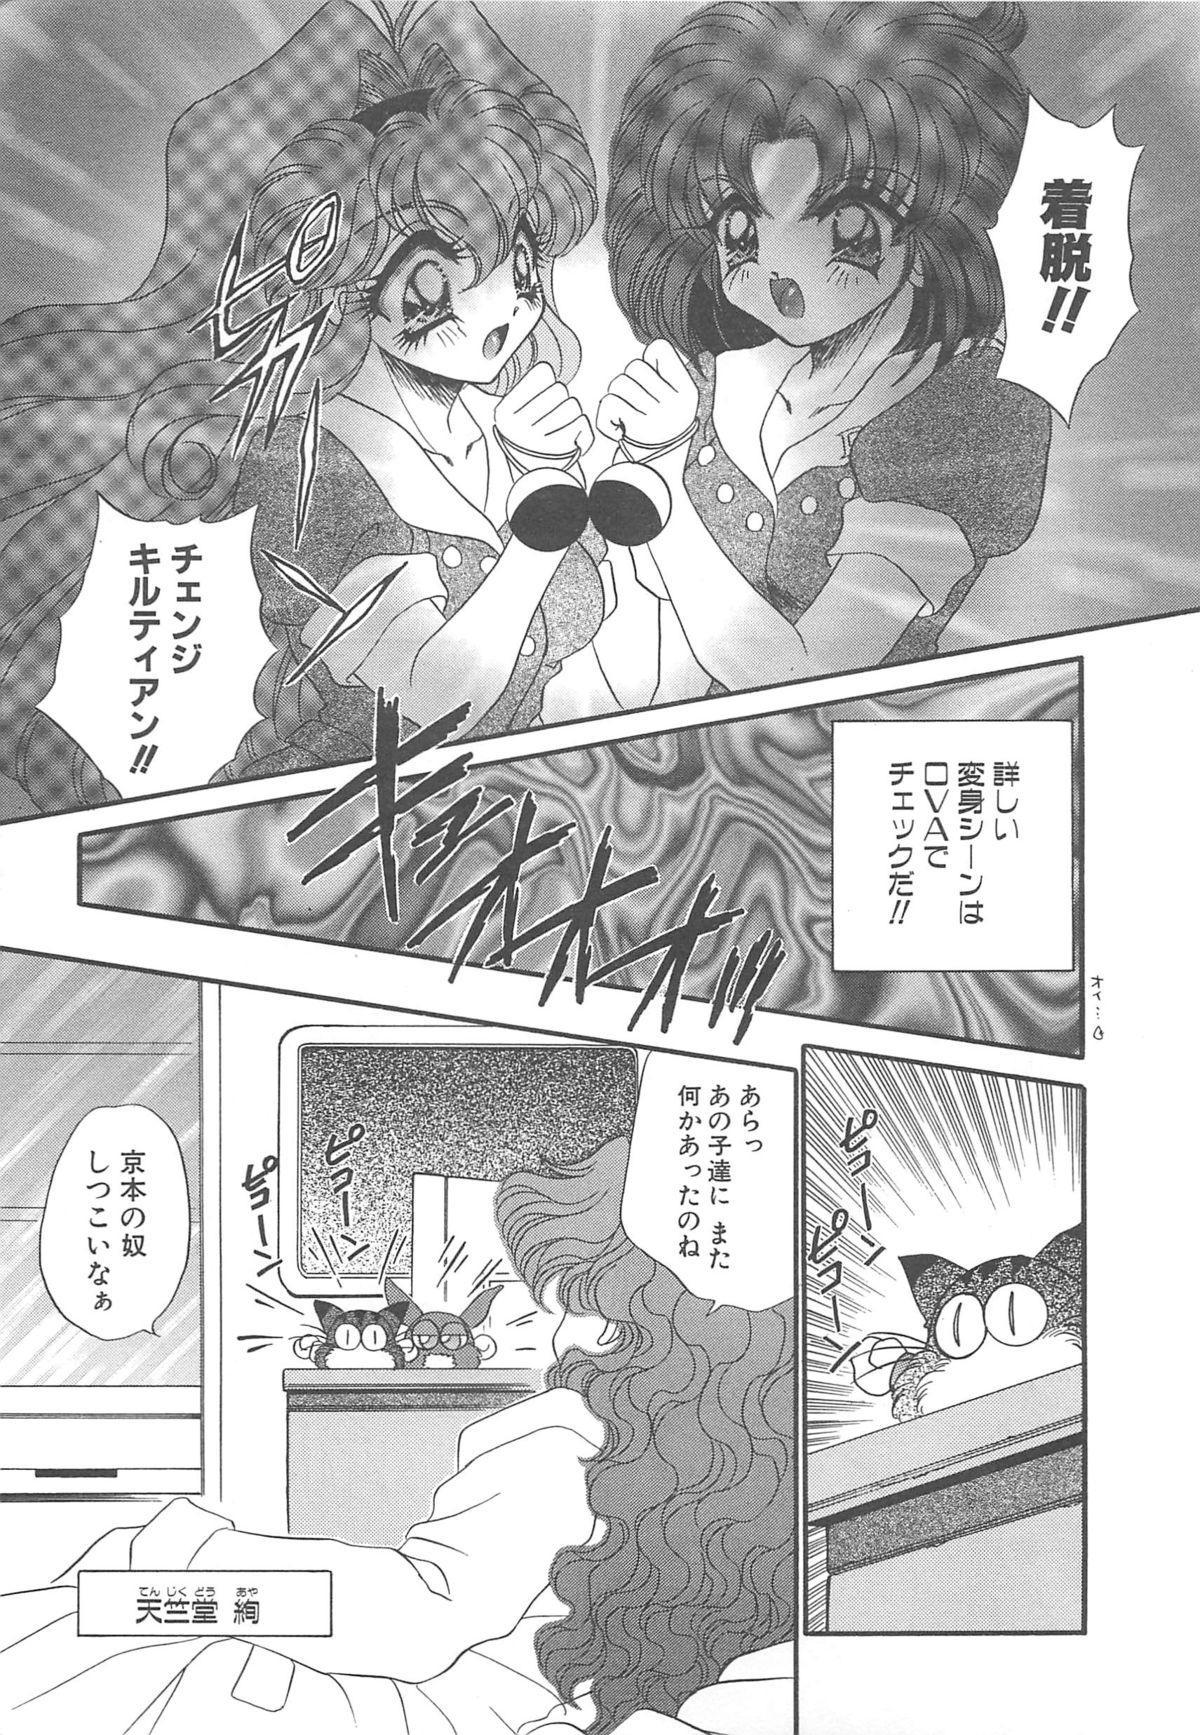 Kigurumi Sentai Quiltian 11